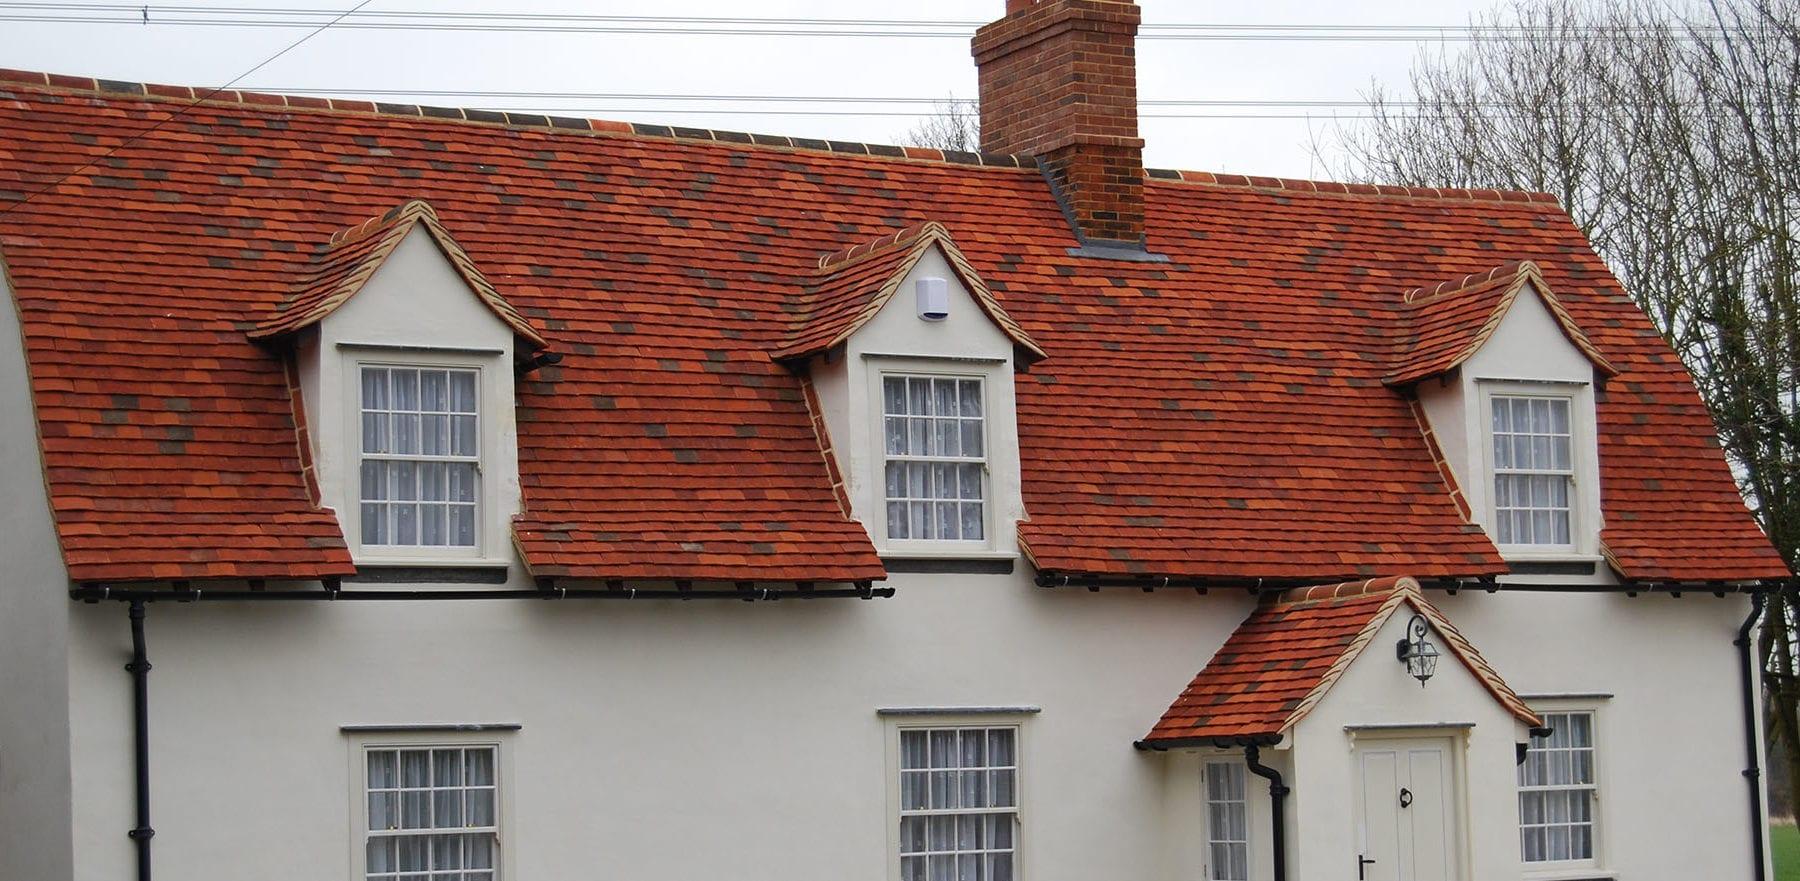 Lifestiles - Handmade Multi Clay Roof Tiles - Gainsford End, England 7